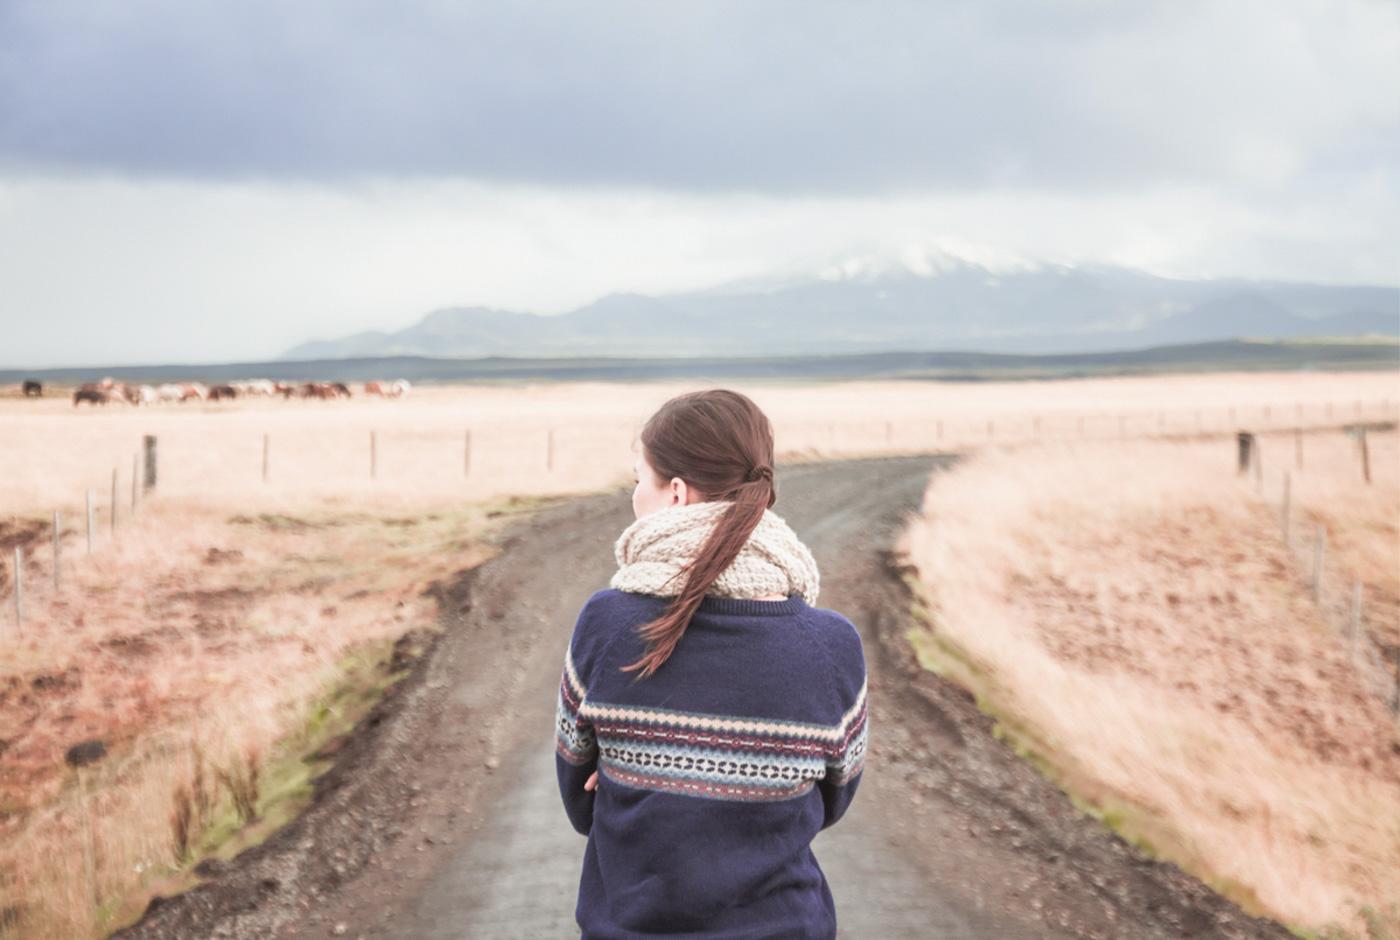 Droga offroad na Islandii. Droga szutrowa